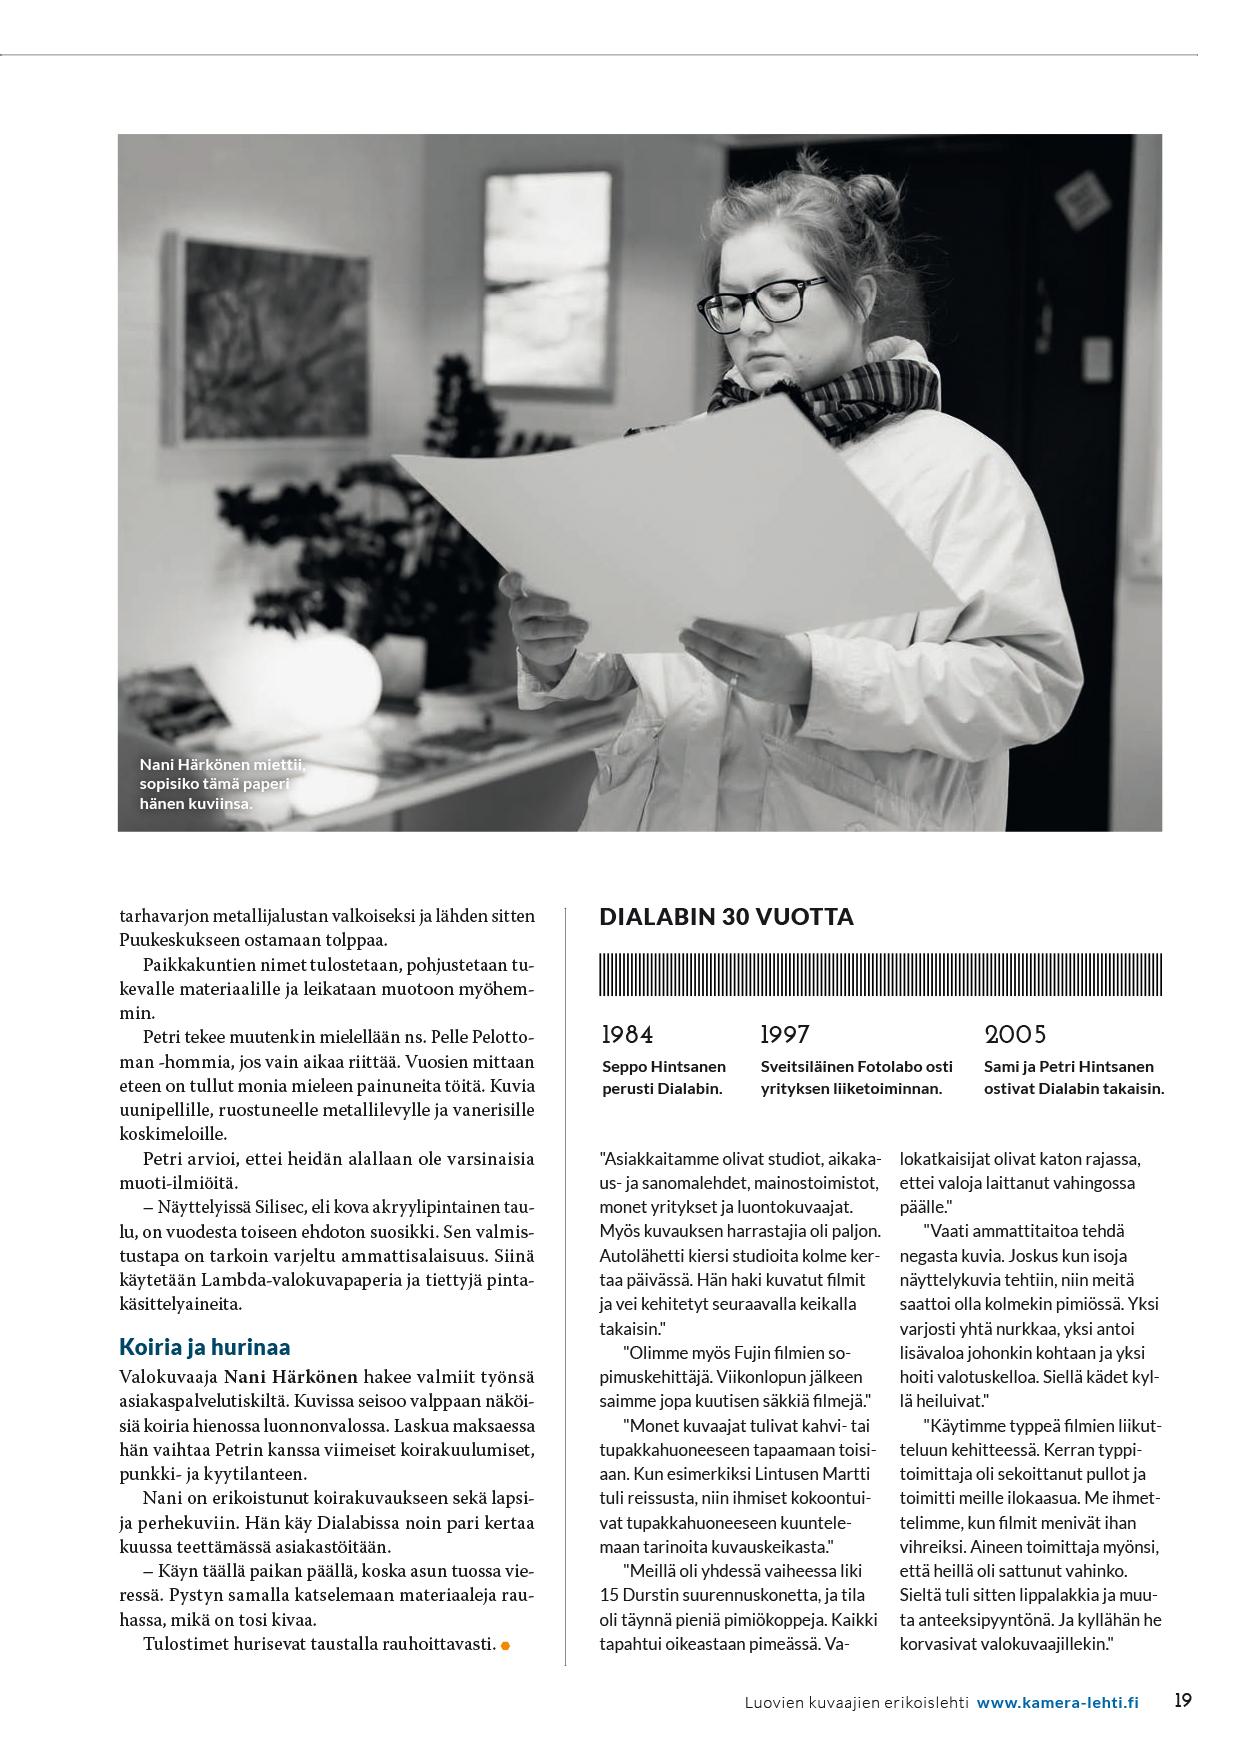 Kuvapäivä_Kamera-lehti_6-7-2014.pdf-4.jpg